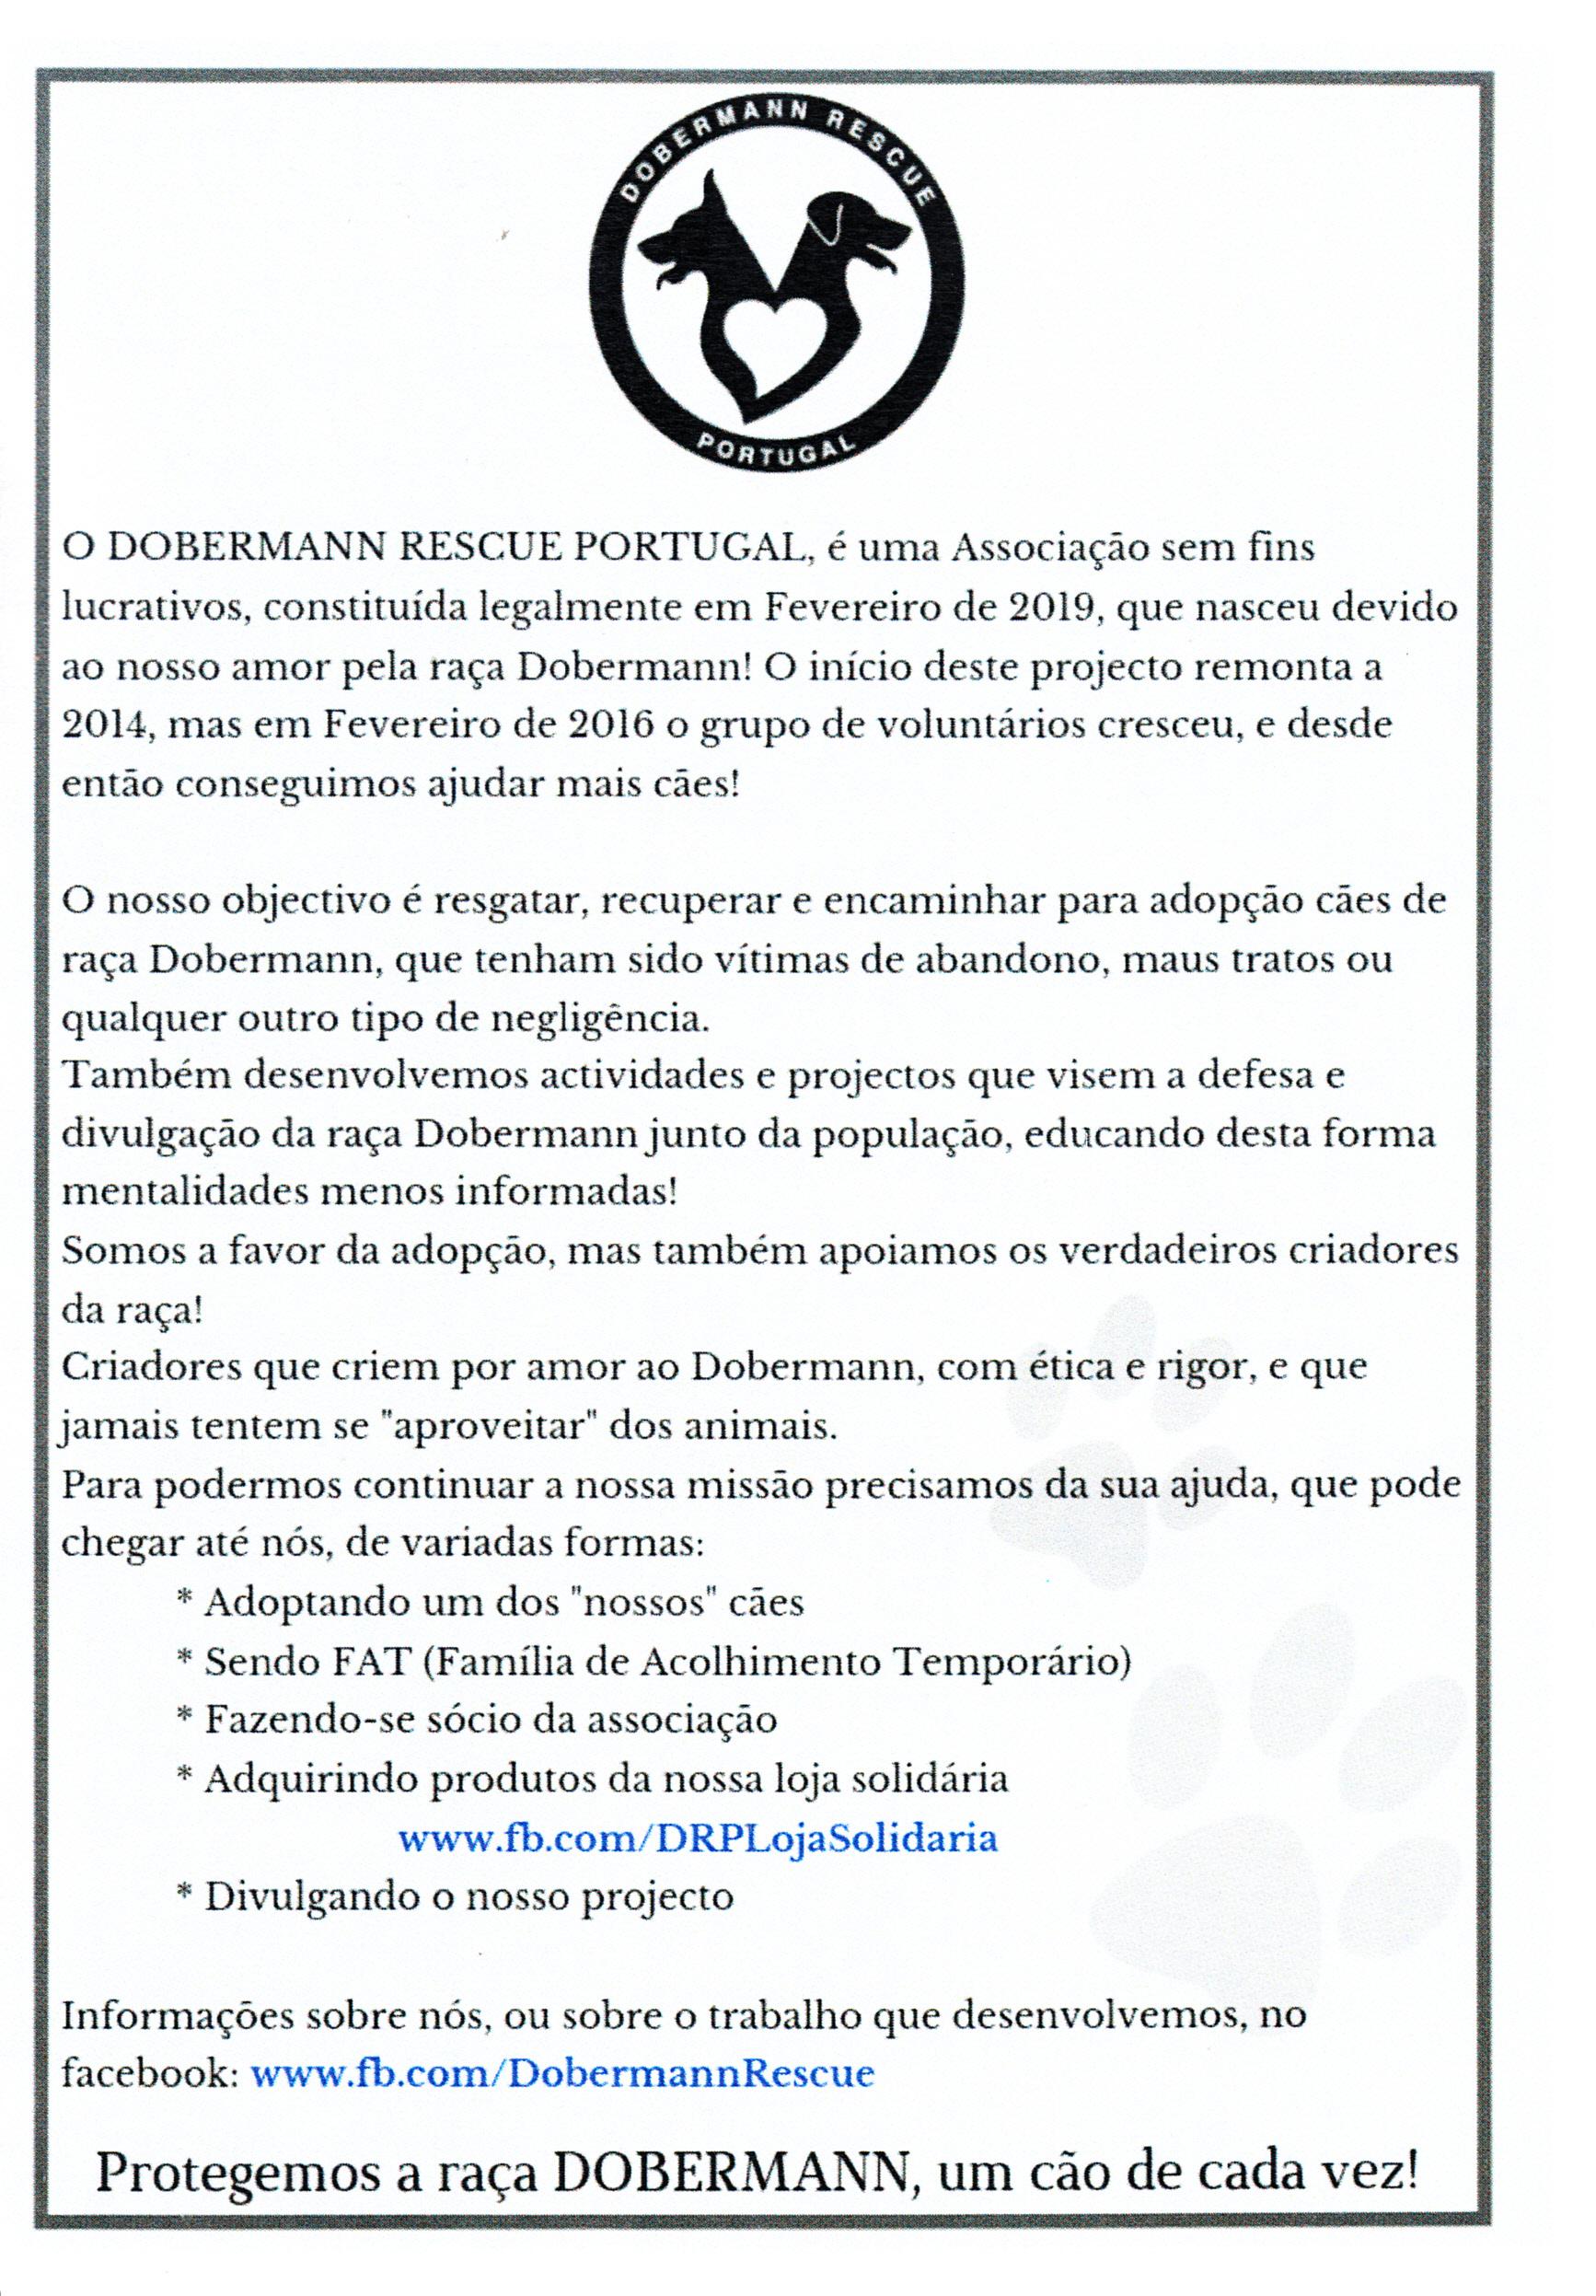 Doberman_2019